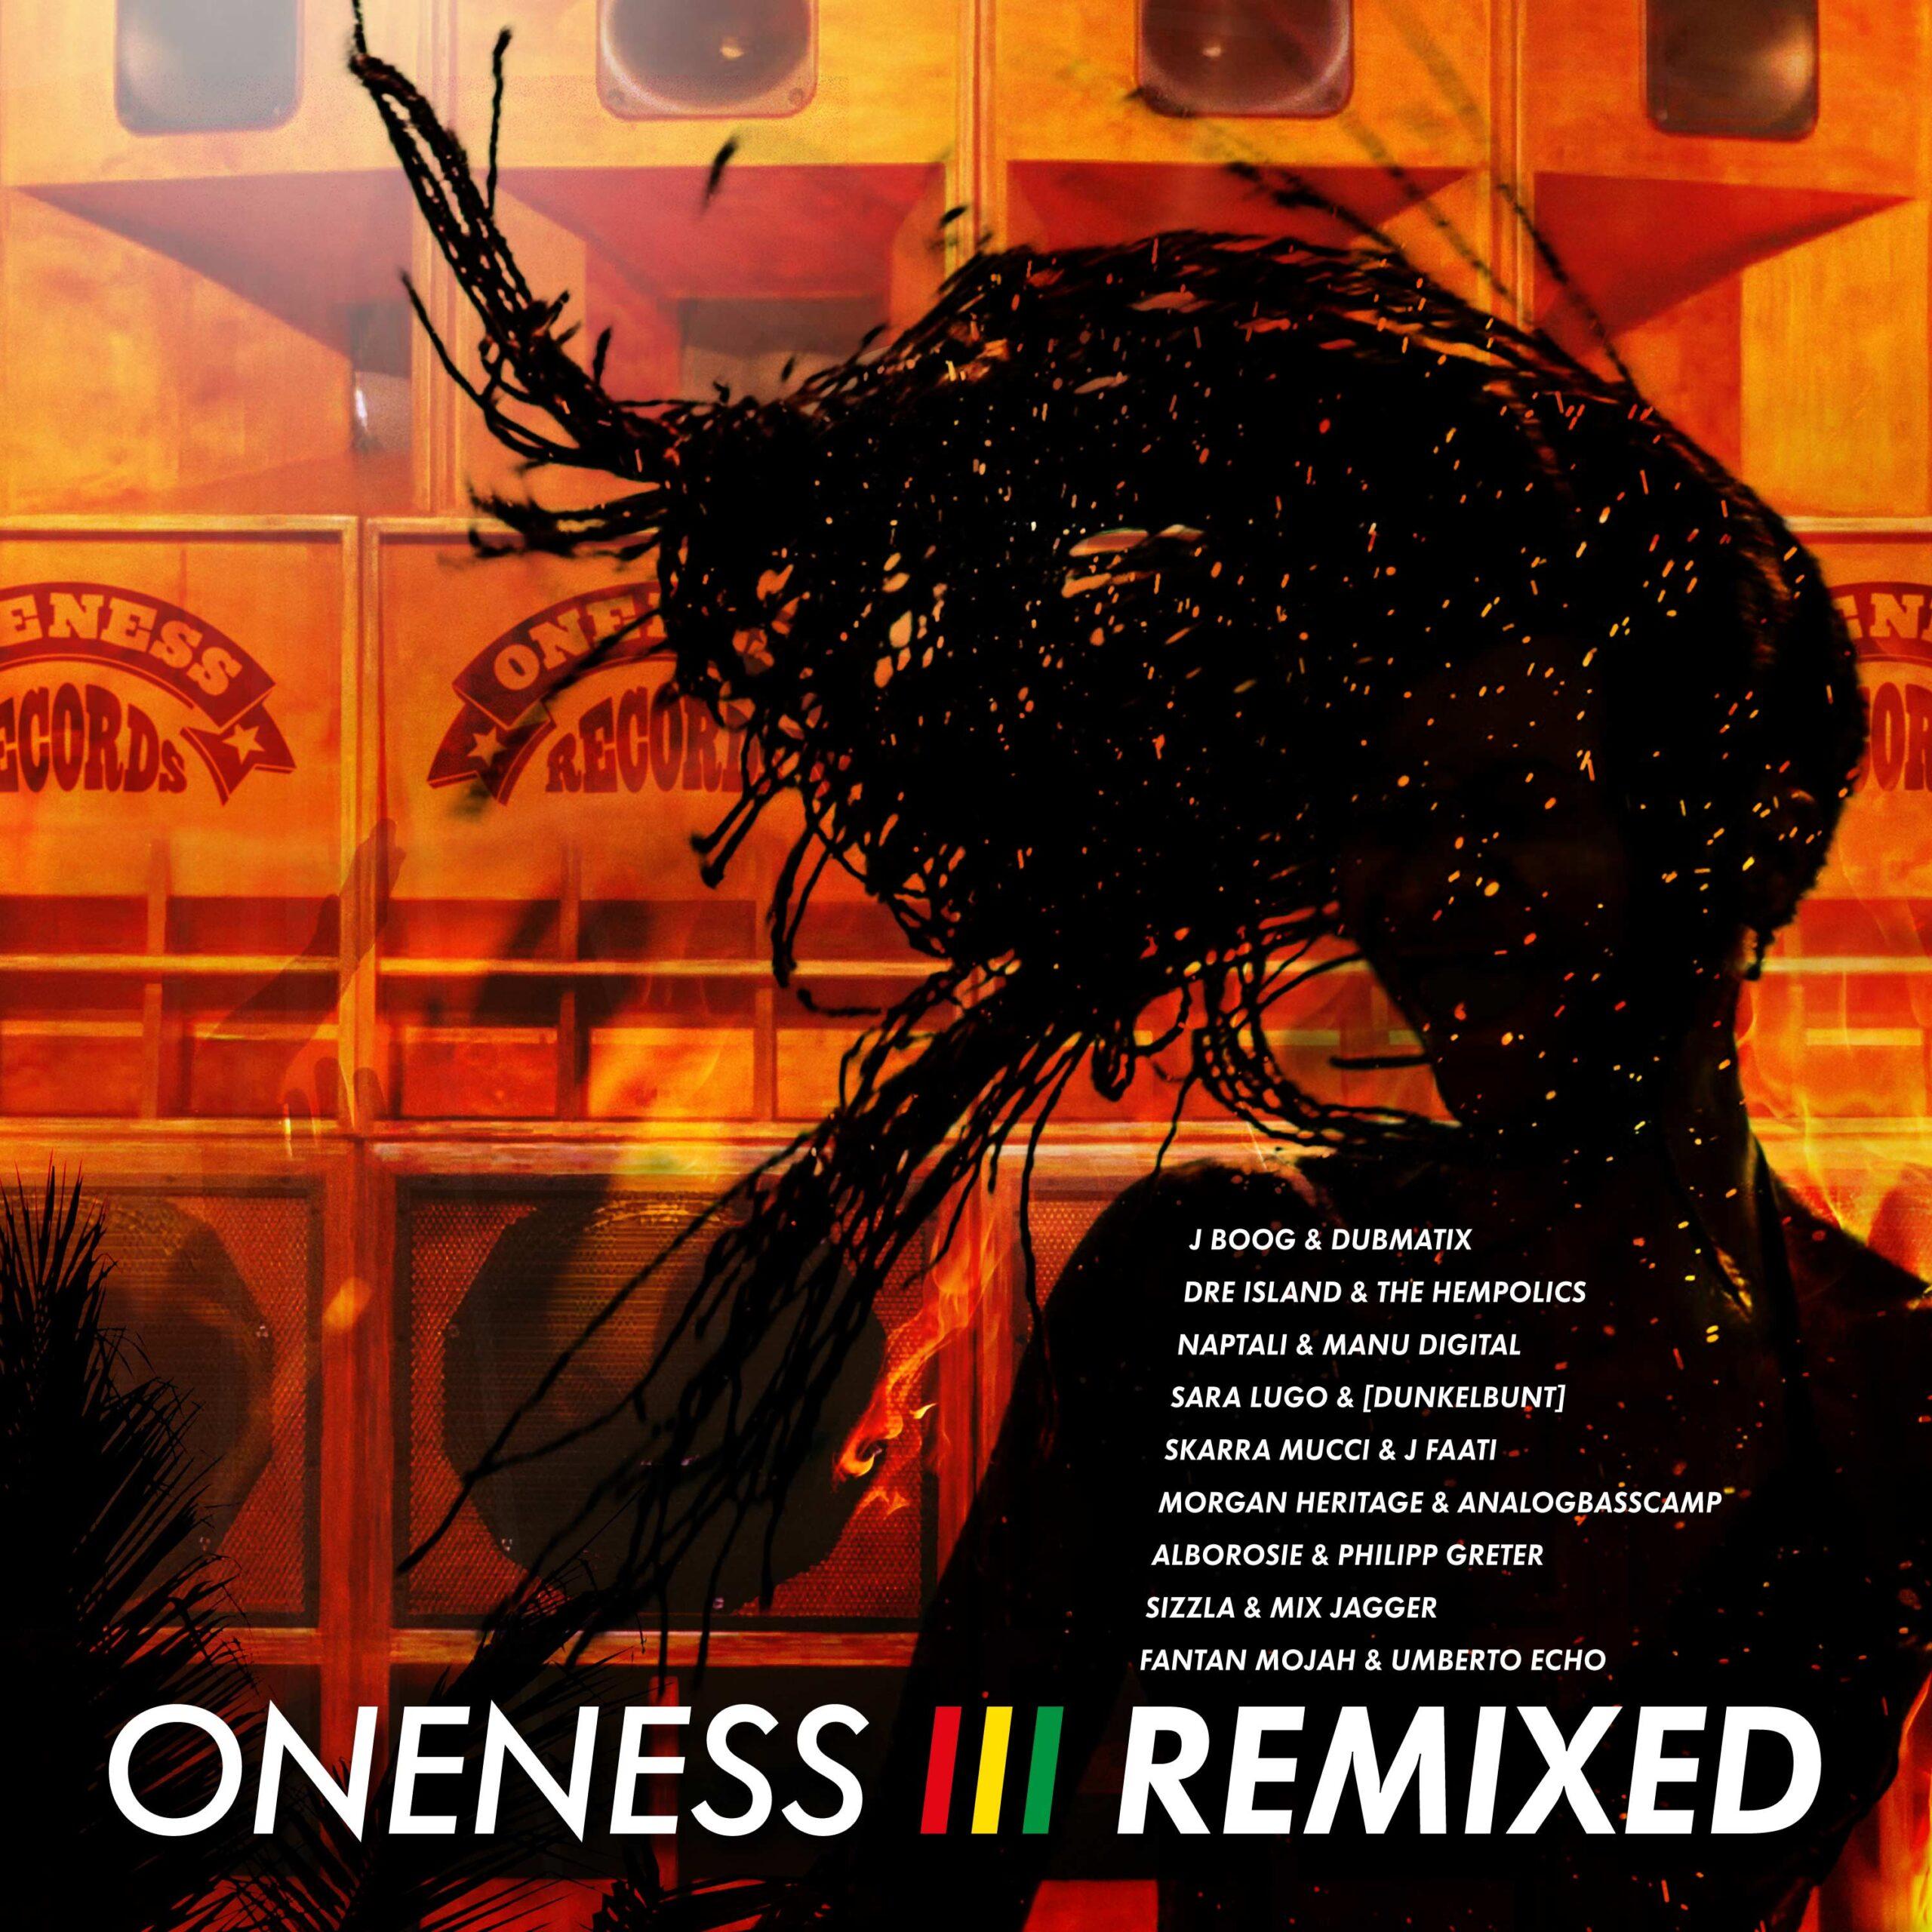 Oneness Remixed